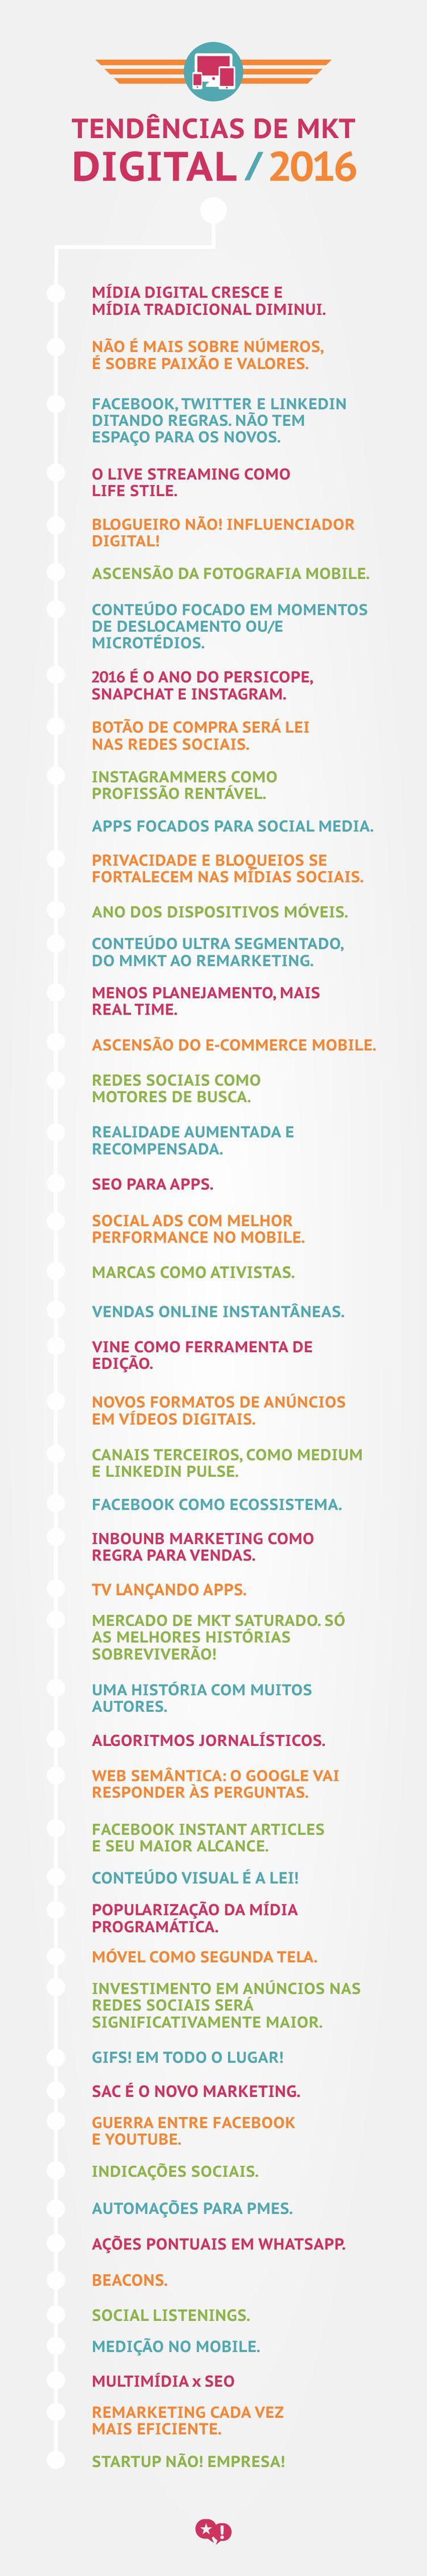 Infográfico: Tendências para o Marketing Digital 2016 | Fabulosa Ideia